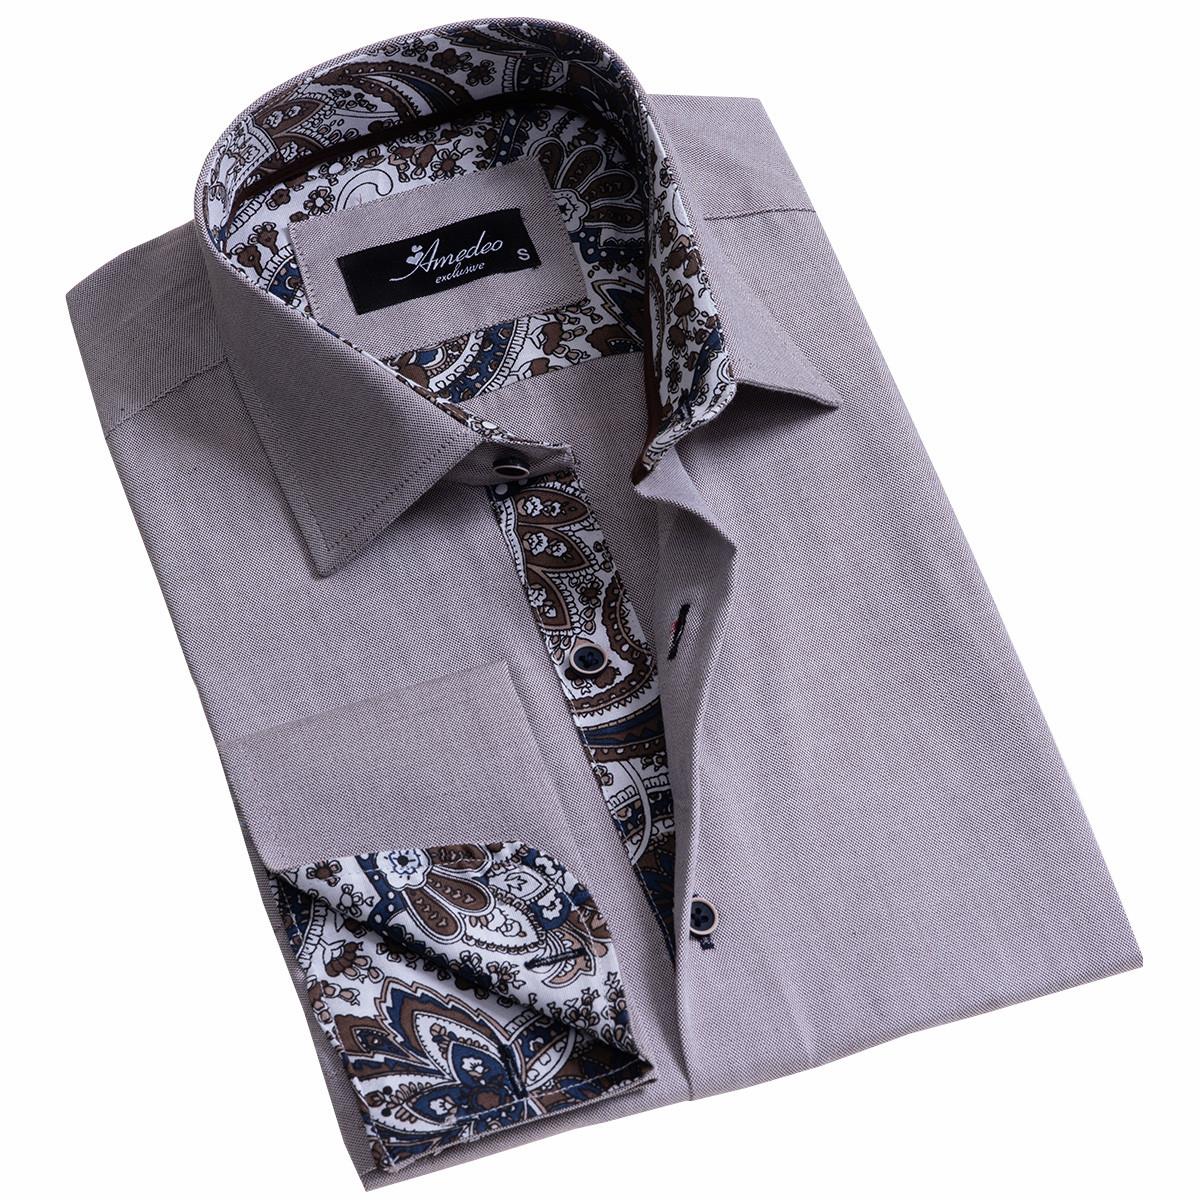 European Made & Designed Reversible Cuff Premium French Cuff Dress Shirt - grey